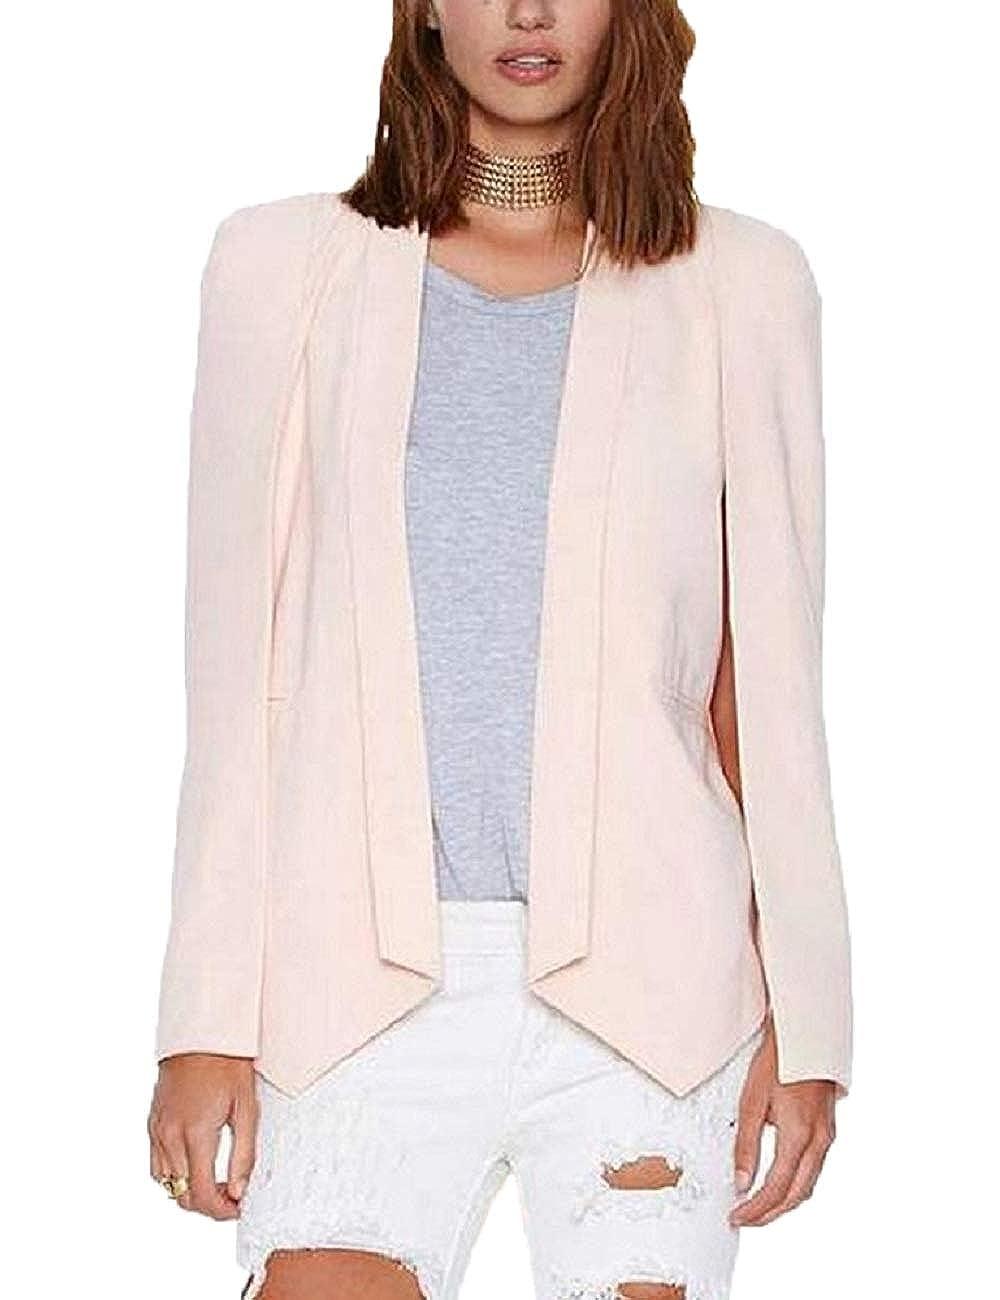 48b72564943 Lrud Women Open Front Cape Blazer Coat Tailored Cardigan Boyfriend Suit  Jacket  Amazon.co.uk  Clothing